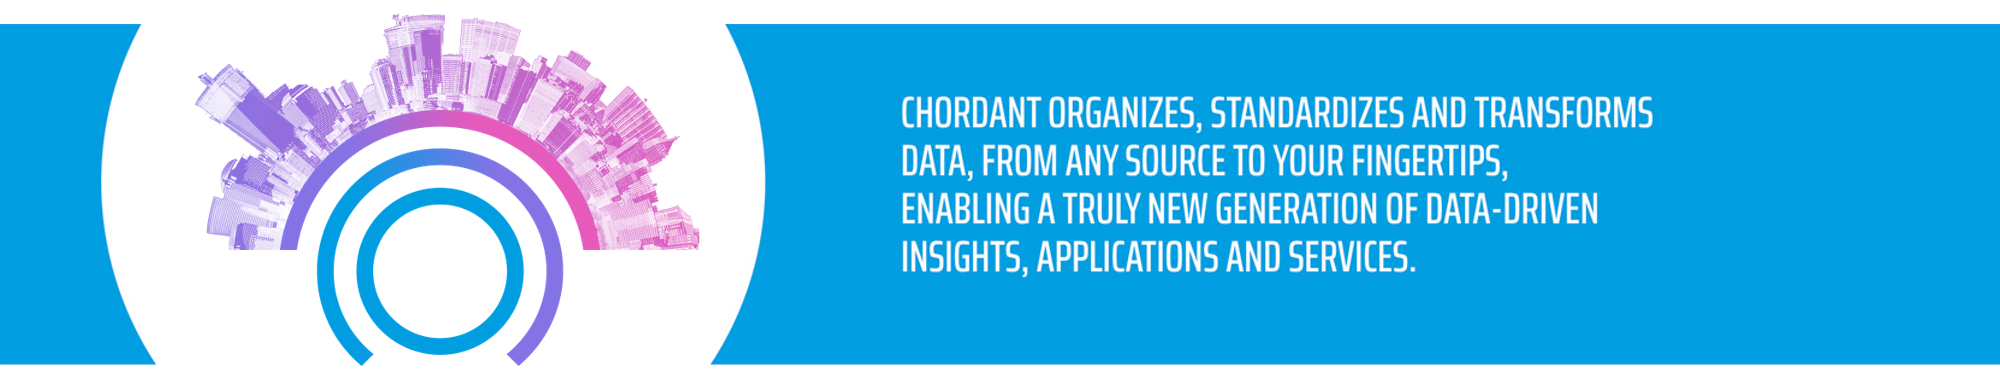 [Chordant] Data Sharing Solutions